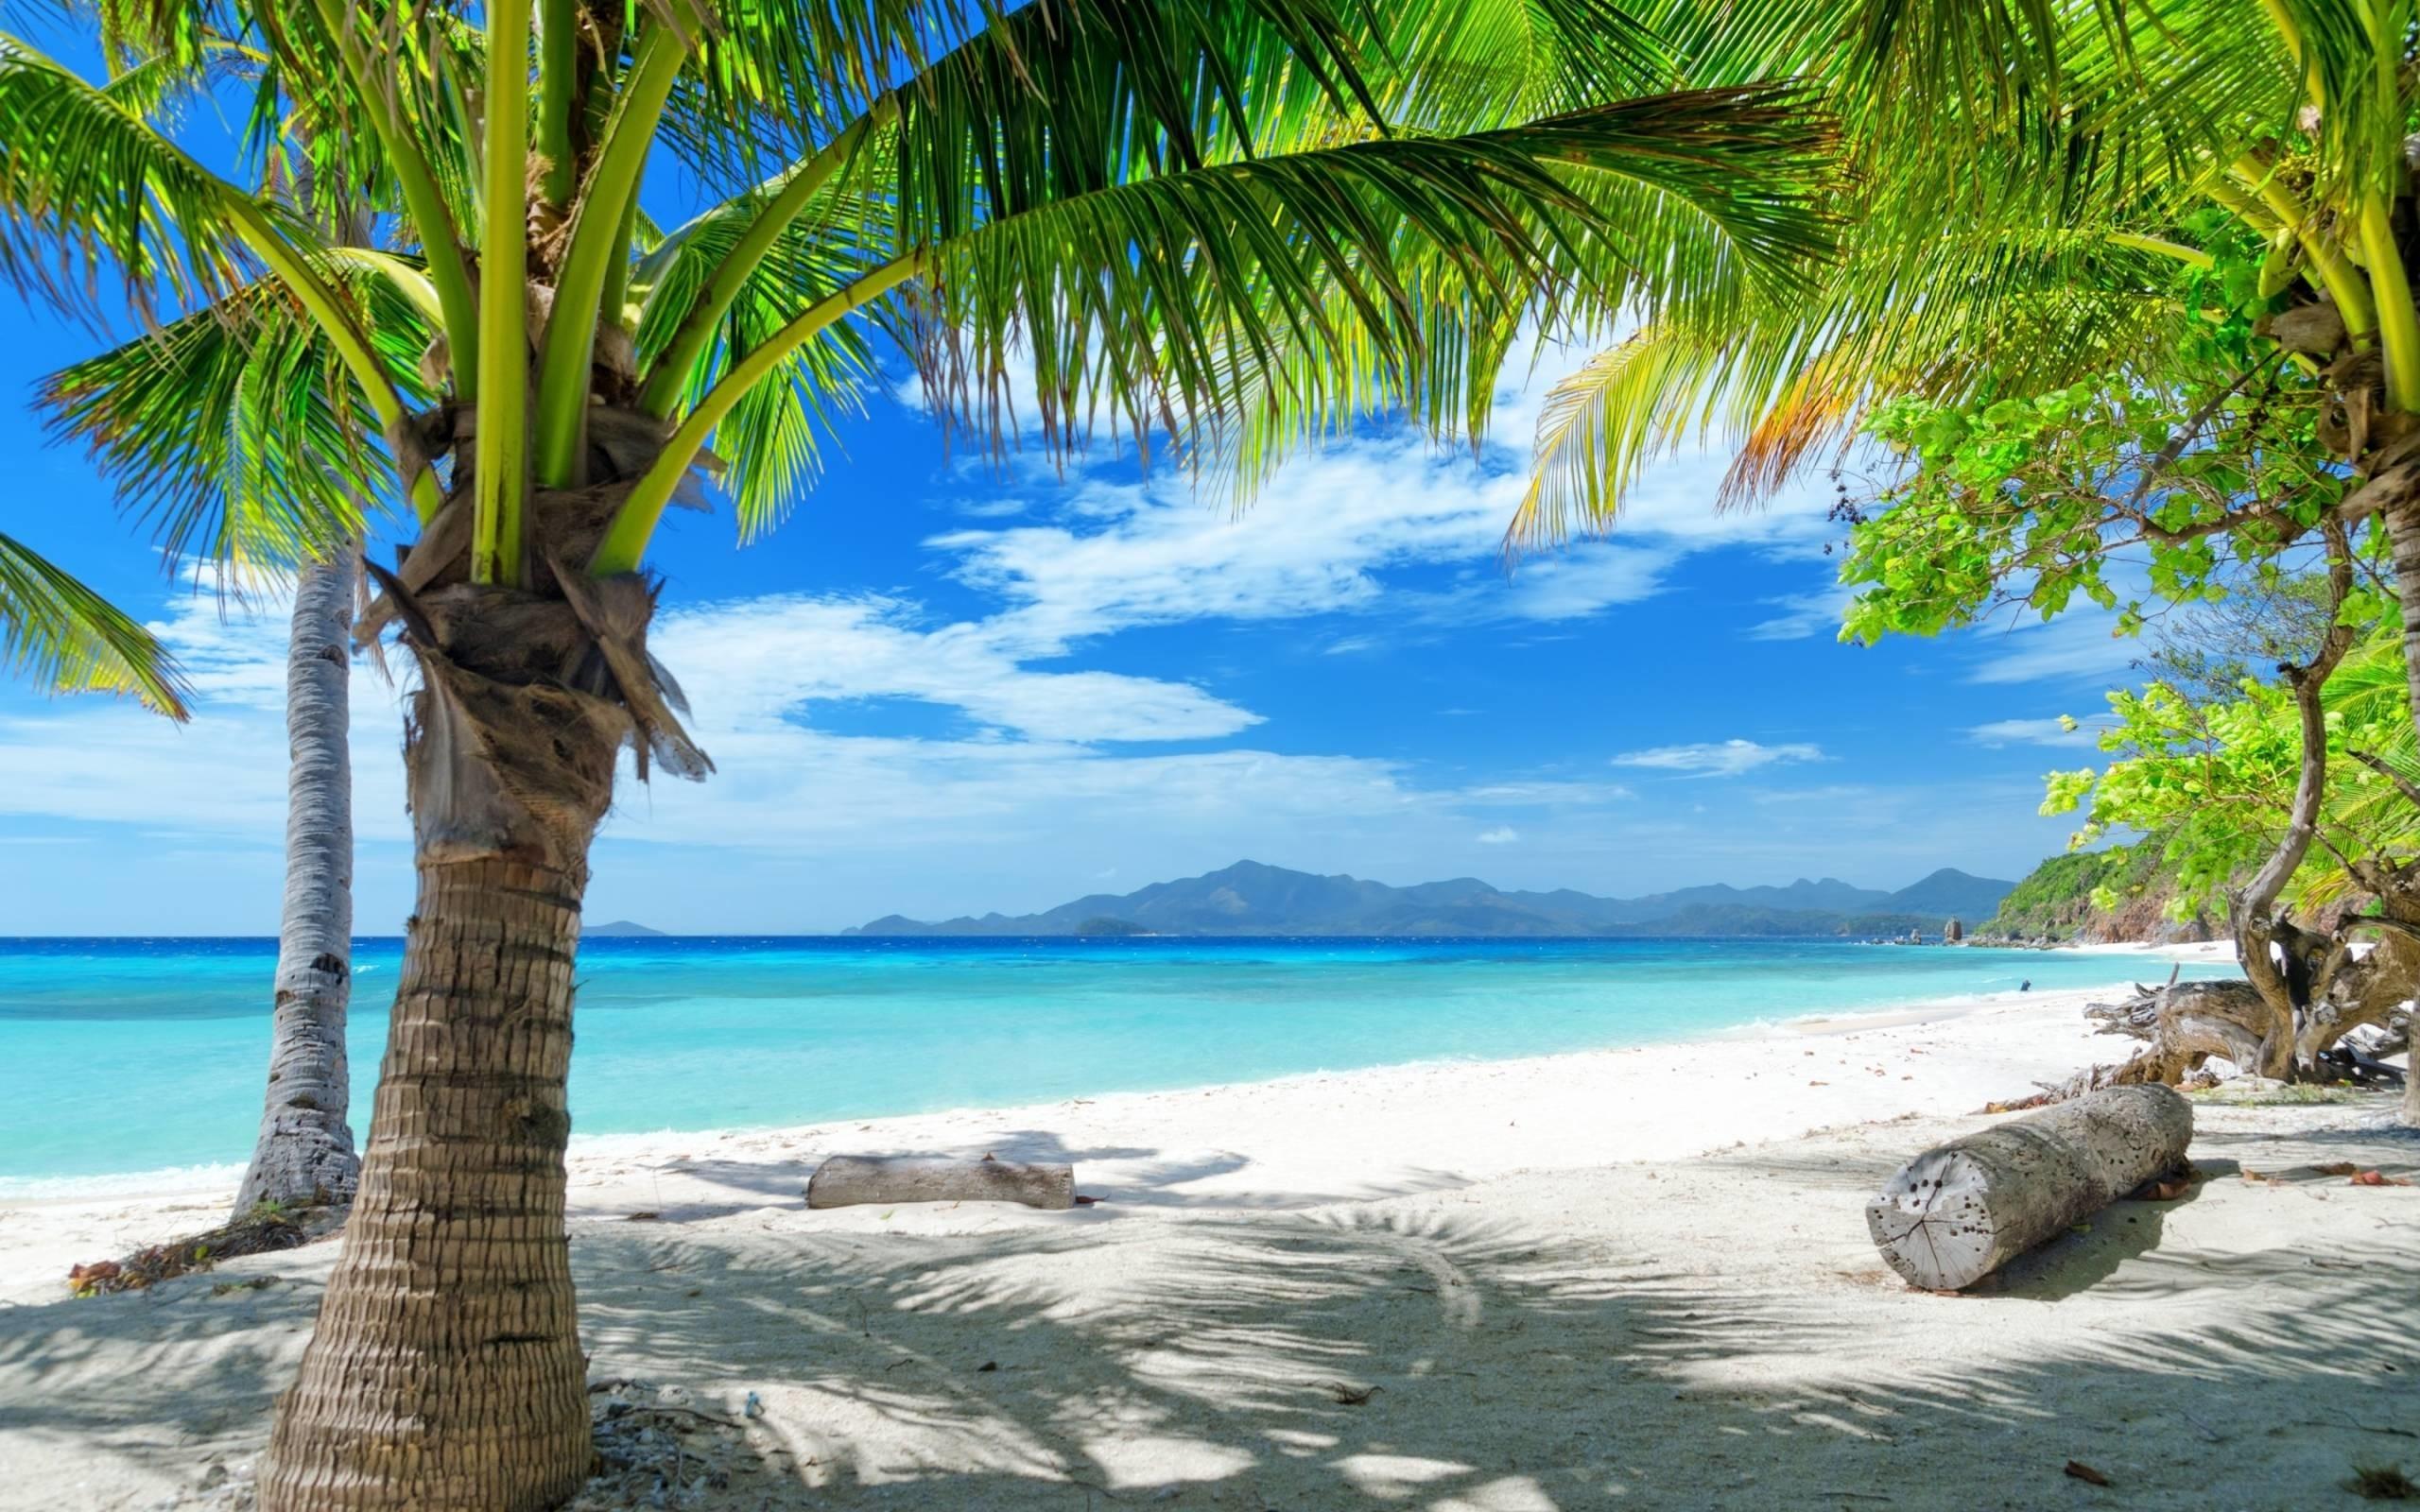 Tempting ocean beach with palm trees HD Desktop Wallpaper | HD .